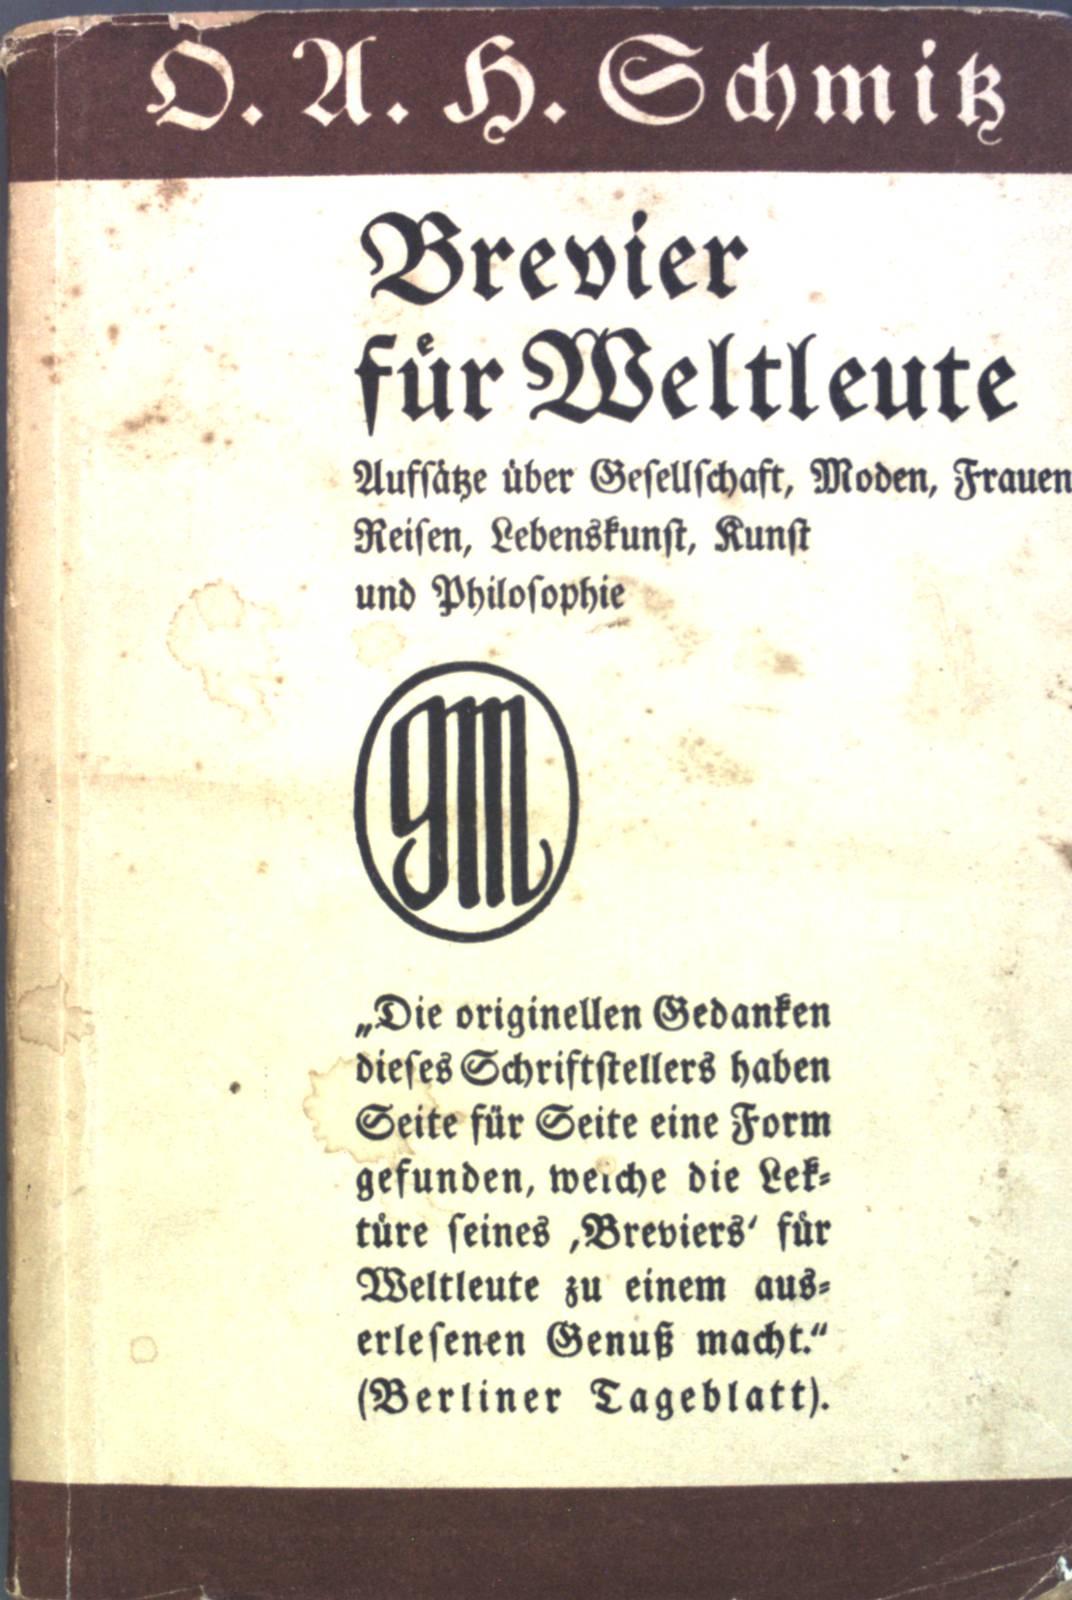 Brevier für Weltleute: Essays über Gesellschaft, Mode,: Schmitz, Oscar A.